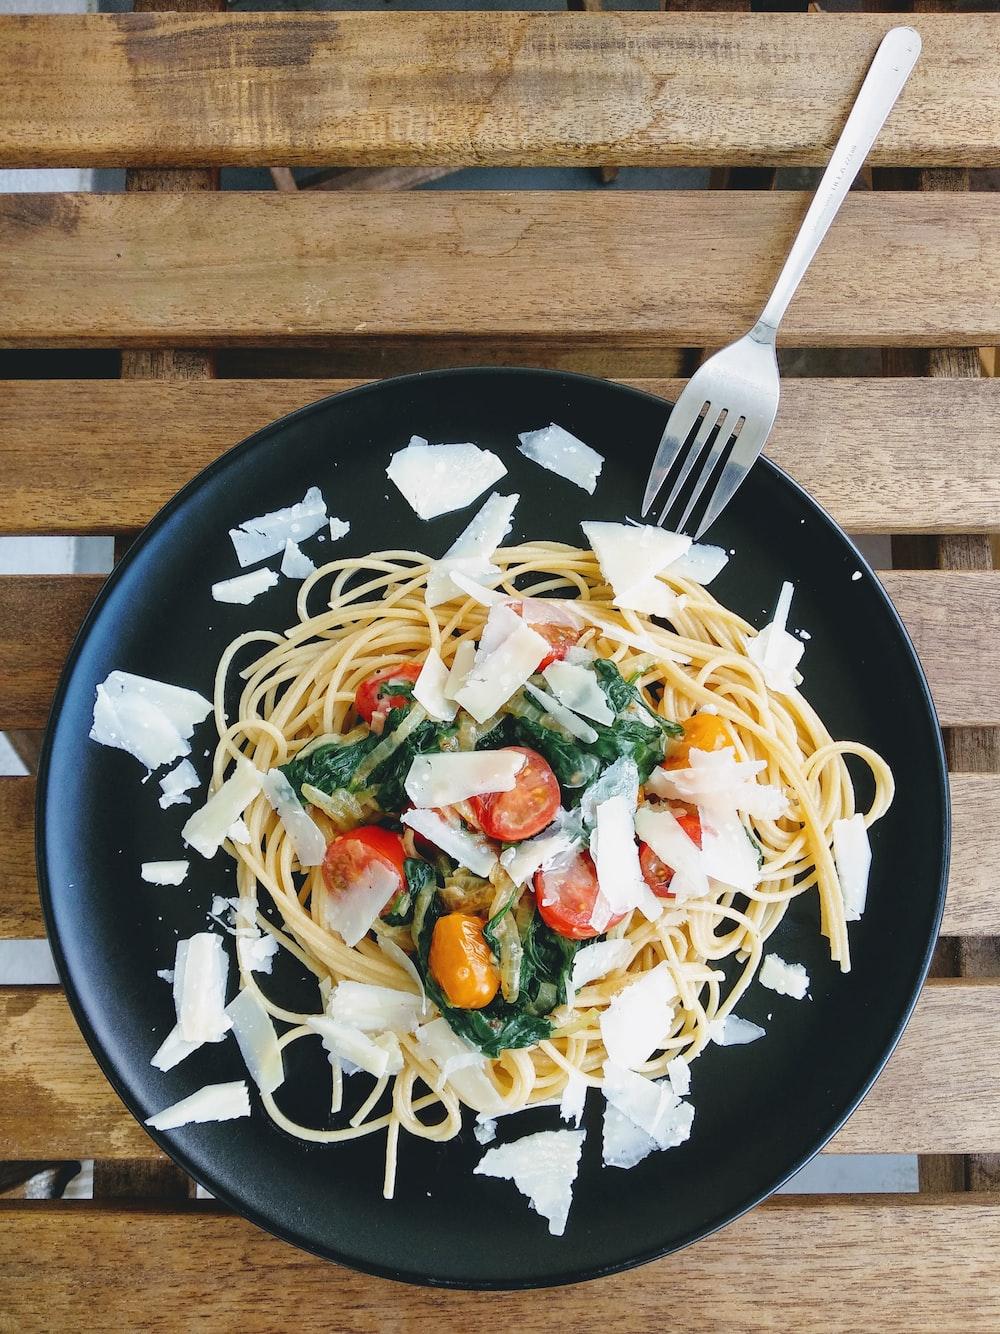 pasta dish on black ceramic plate